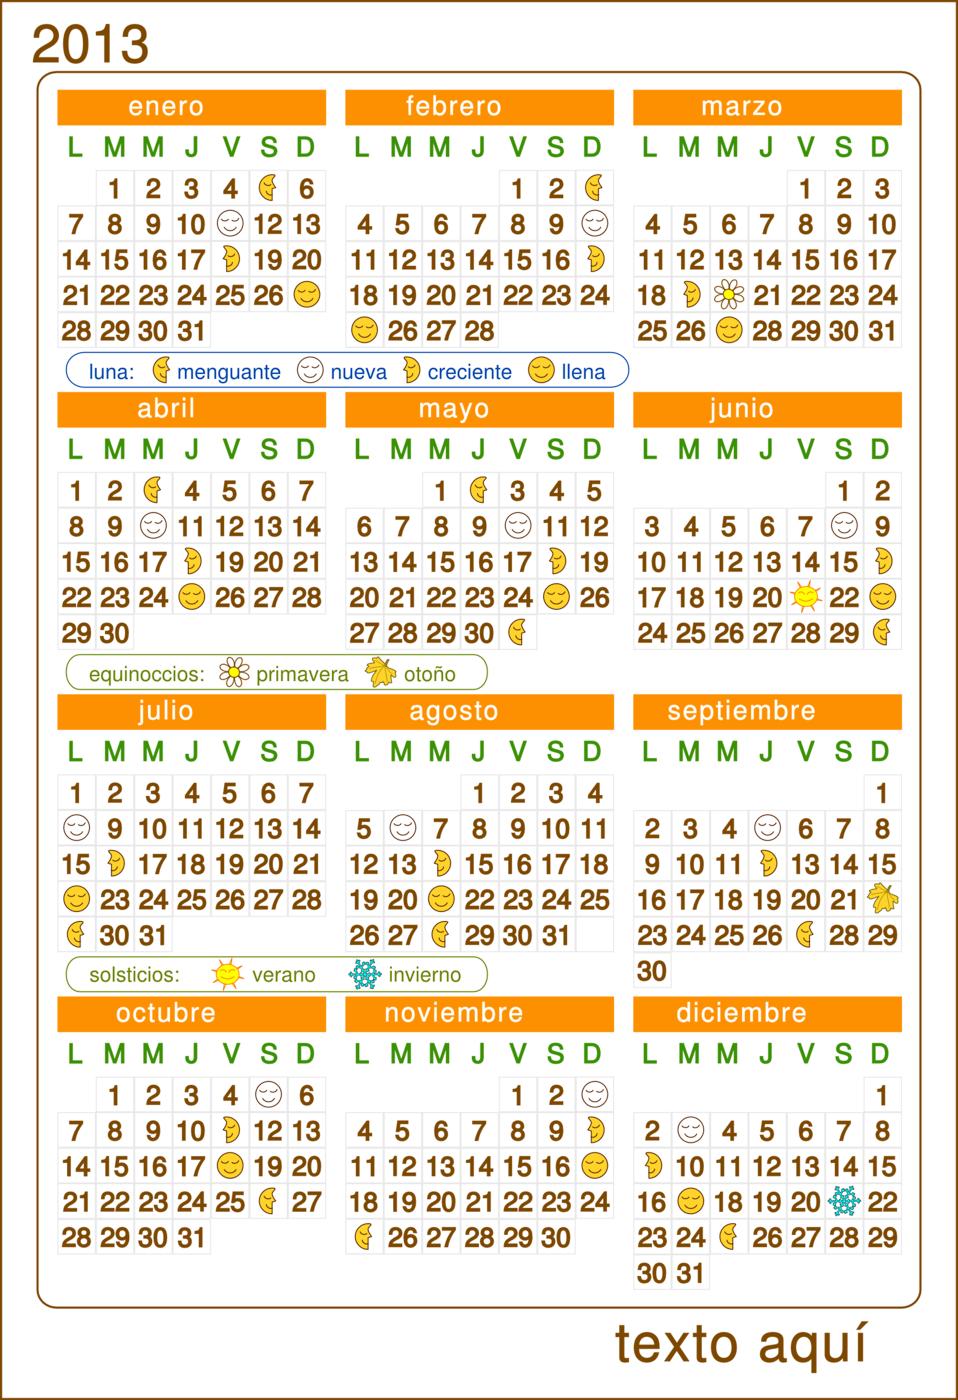 Calendario 2013 Calendar v.2